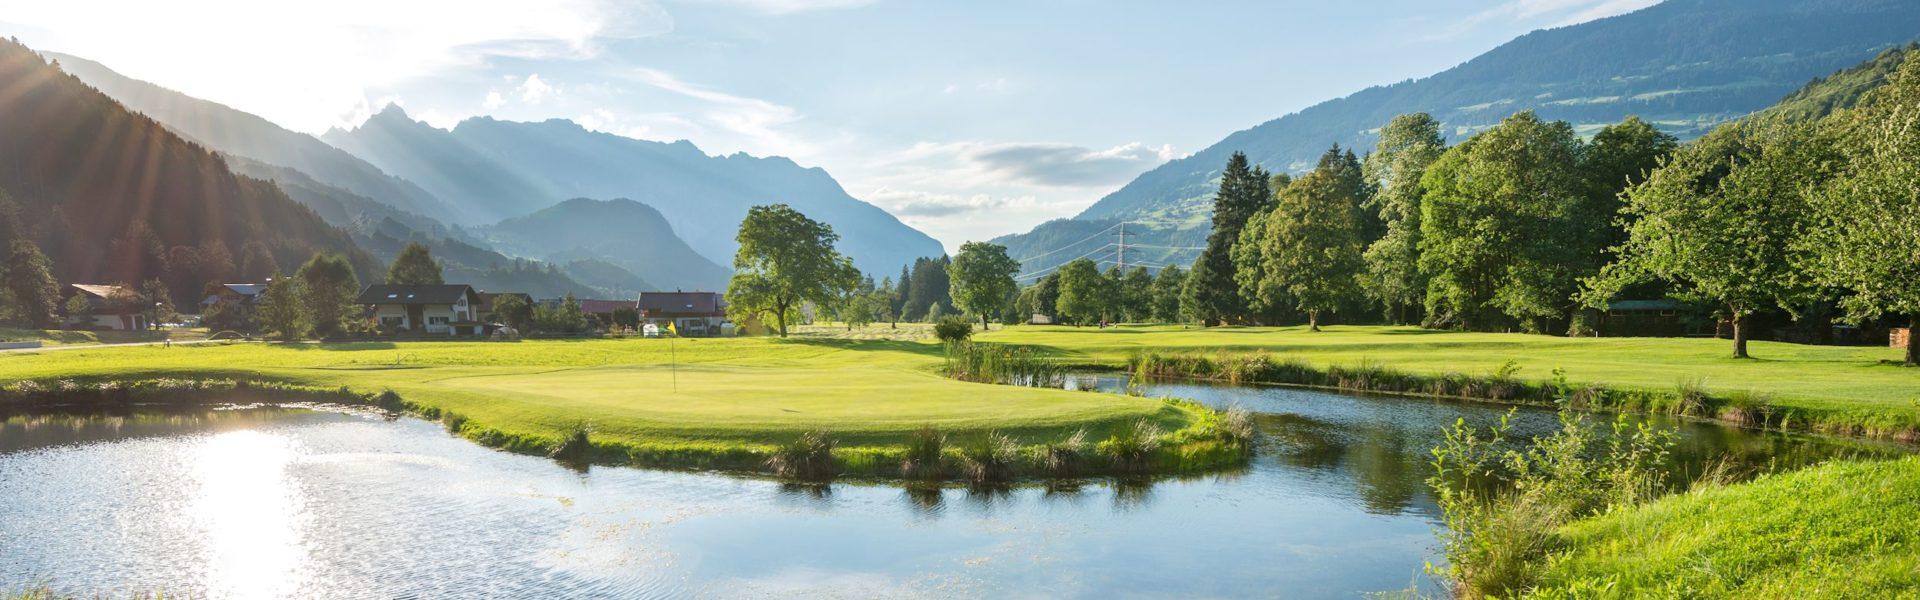 Golfplätze Vorarlberg, Golfclub Montafon (c) Matthias Rhomberg / Vorarlberg Tourismus